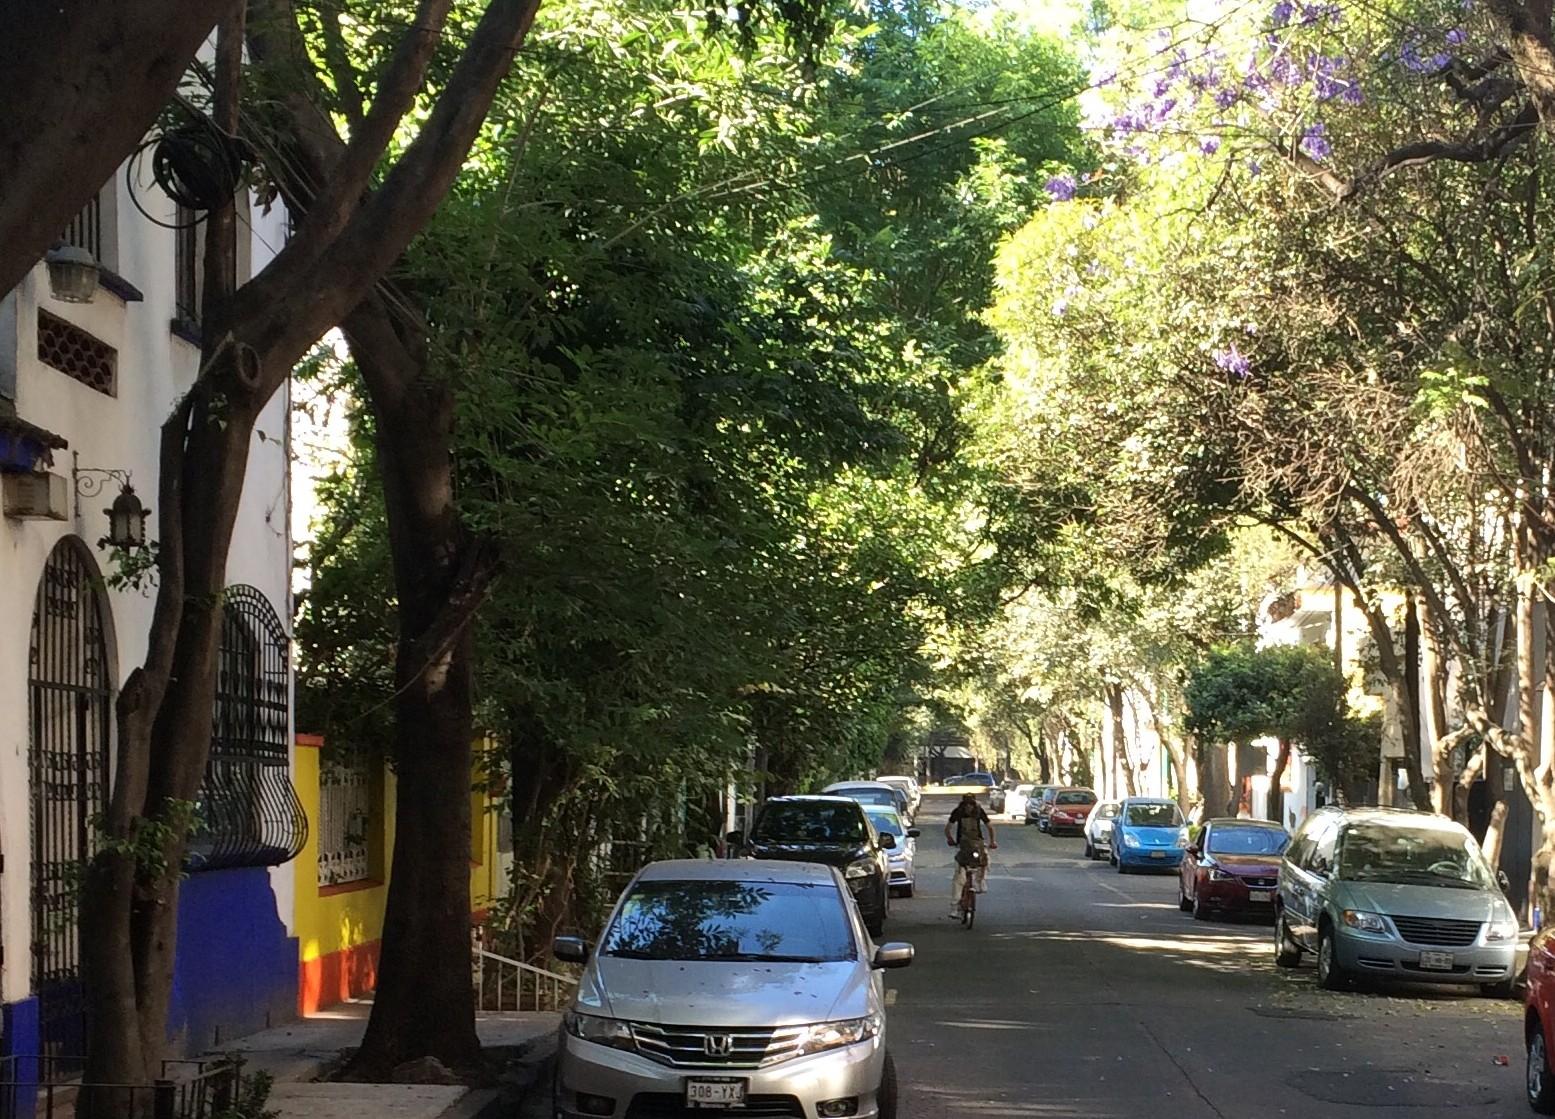 Tree-lined street in Condesa neighborhood